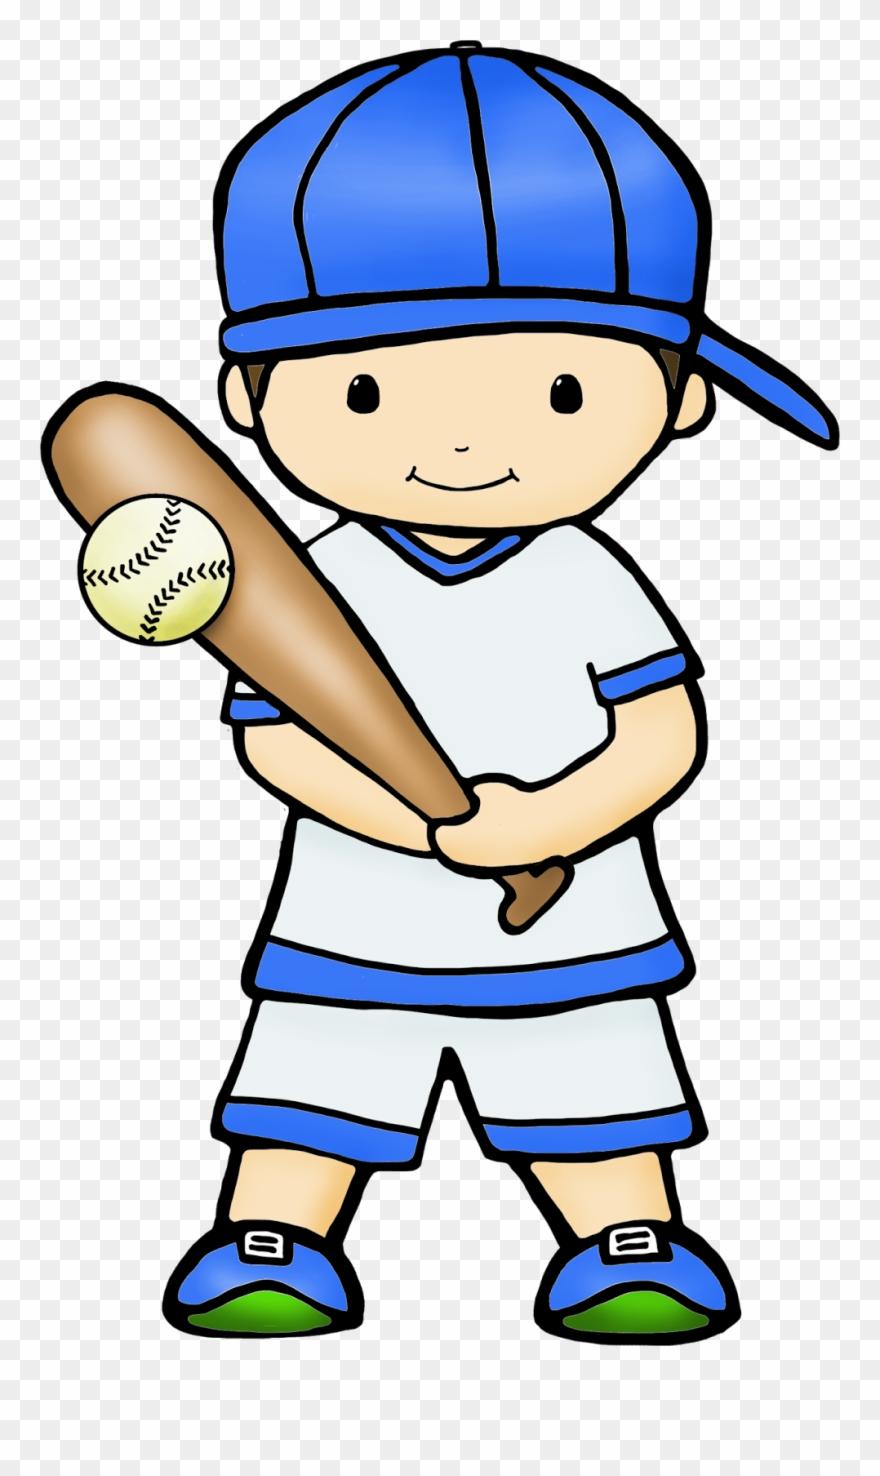 Baseball kid. Cute graphics by play